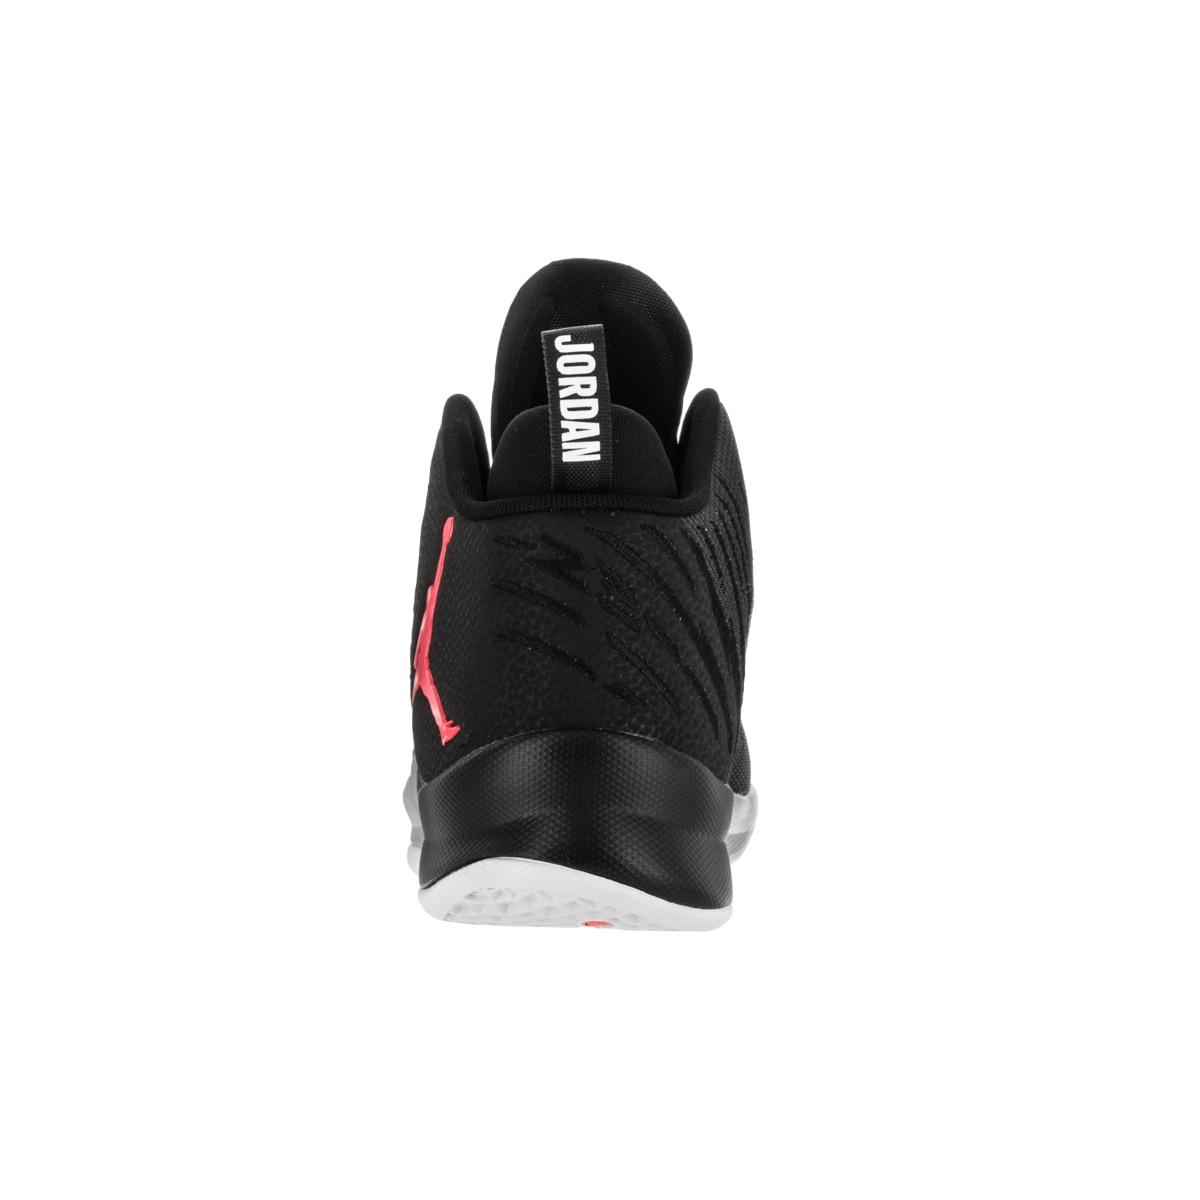 03c891455 Shop Nike Jordan Men s Jordan Super.Fly 5 Black